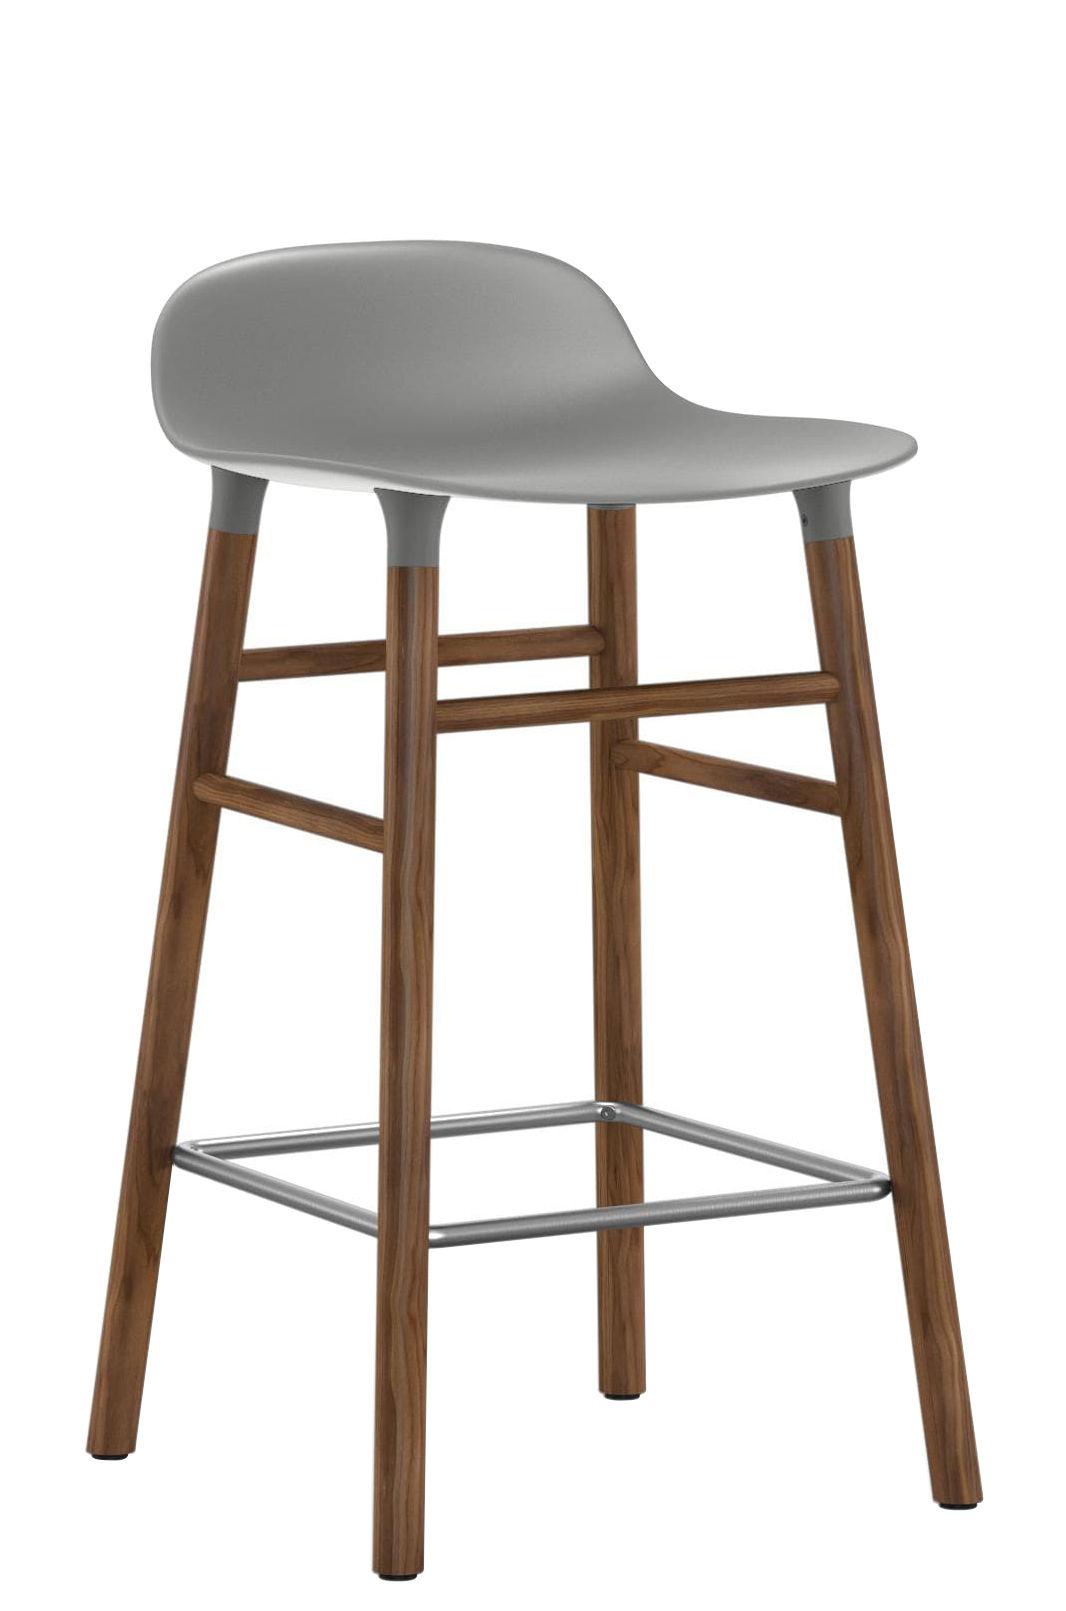 Furniture - Bar Stools - Form Bar stool - H 65 cm / Walnut leg by Normann Copenhagen - Grey /  walnut - Polypropylene, Walnut